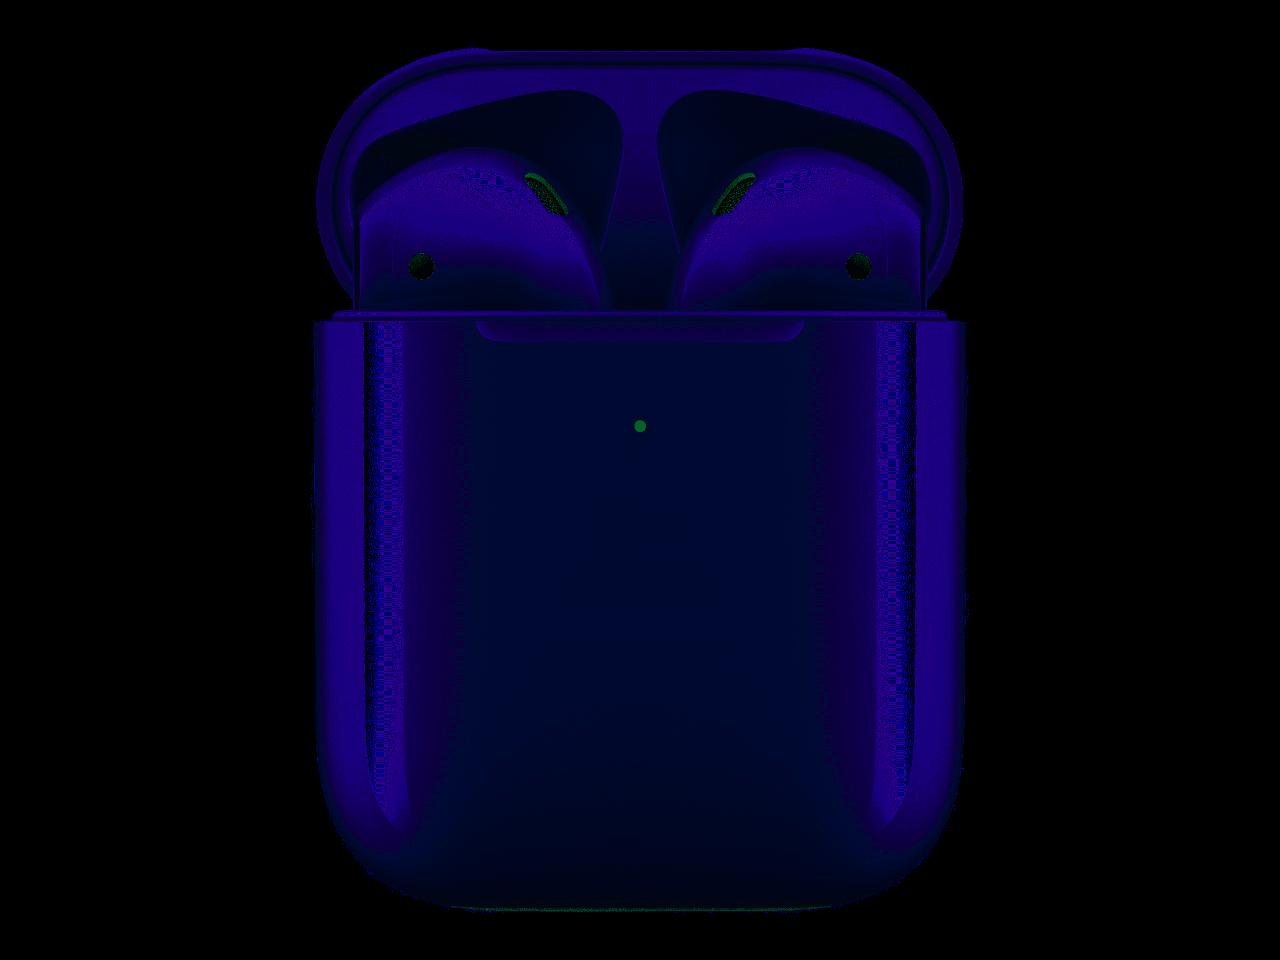 Apple AirPods mit kabellosem Ladecase MRXJ2ZM/A